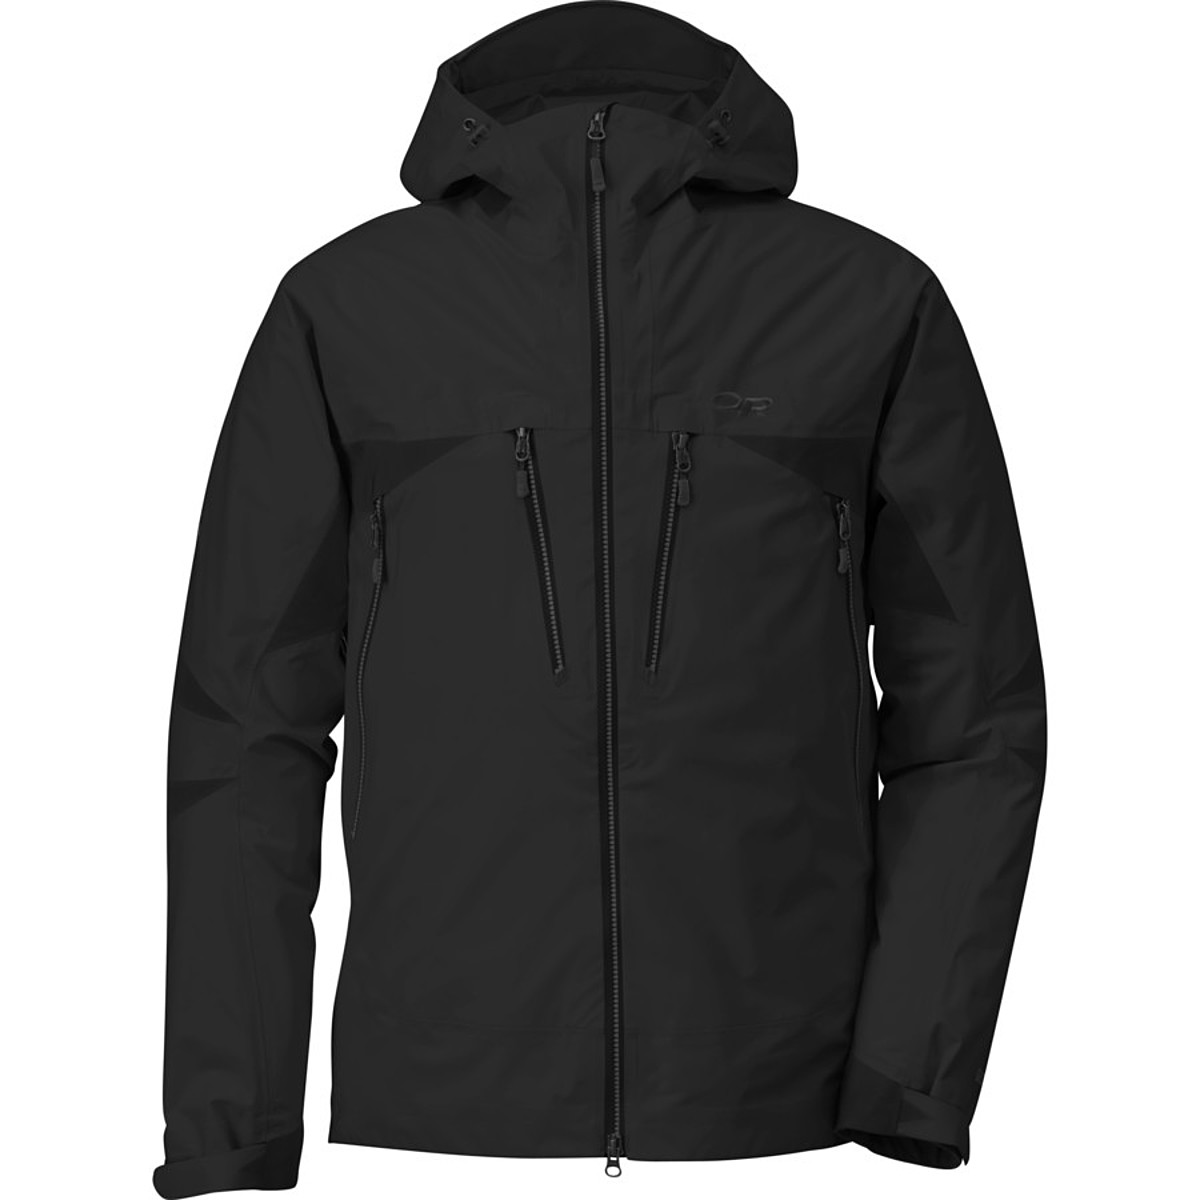 Outdoor Research Maximus Jacket - Men